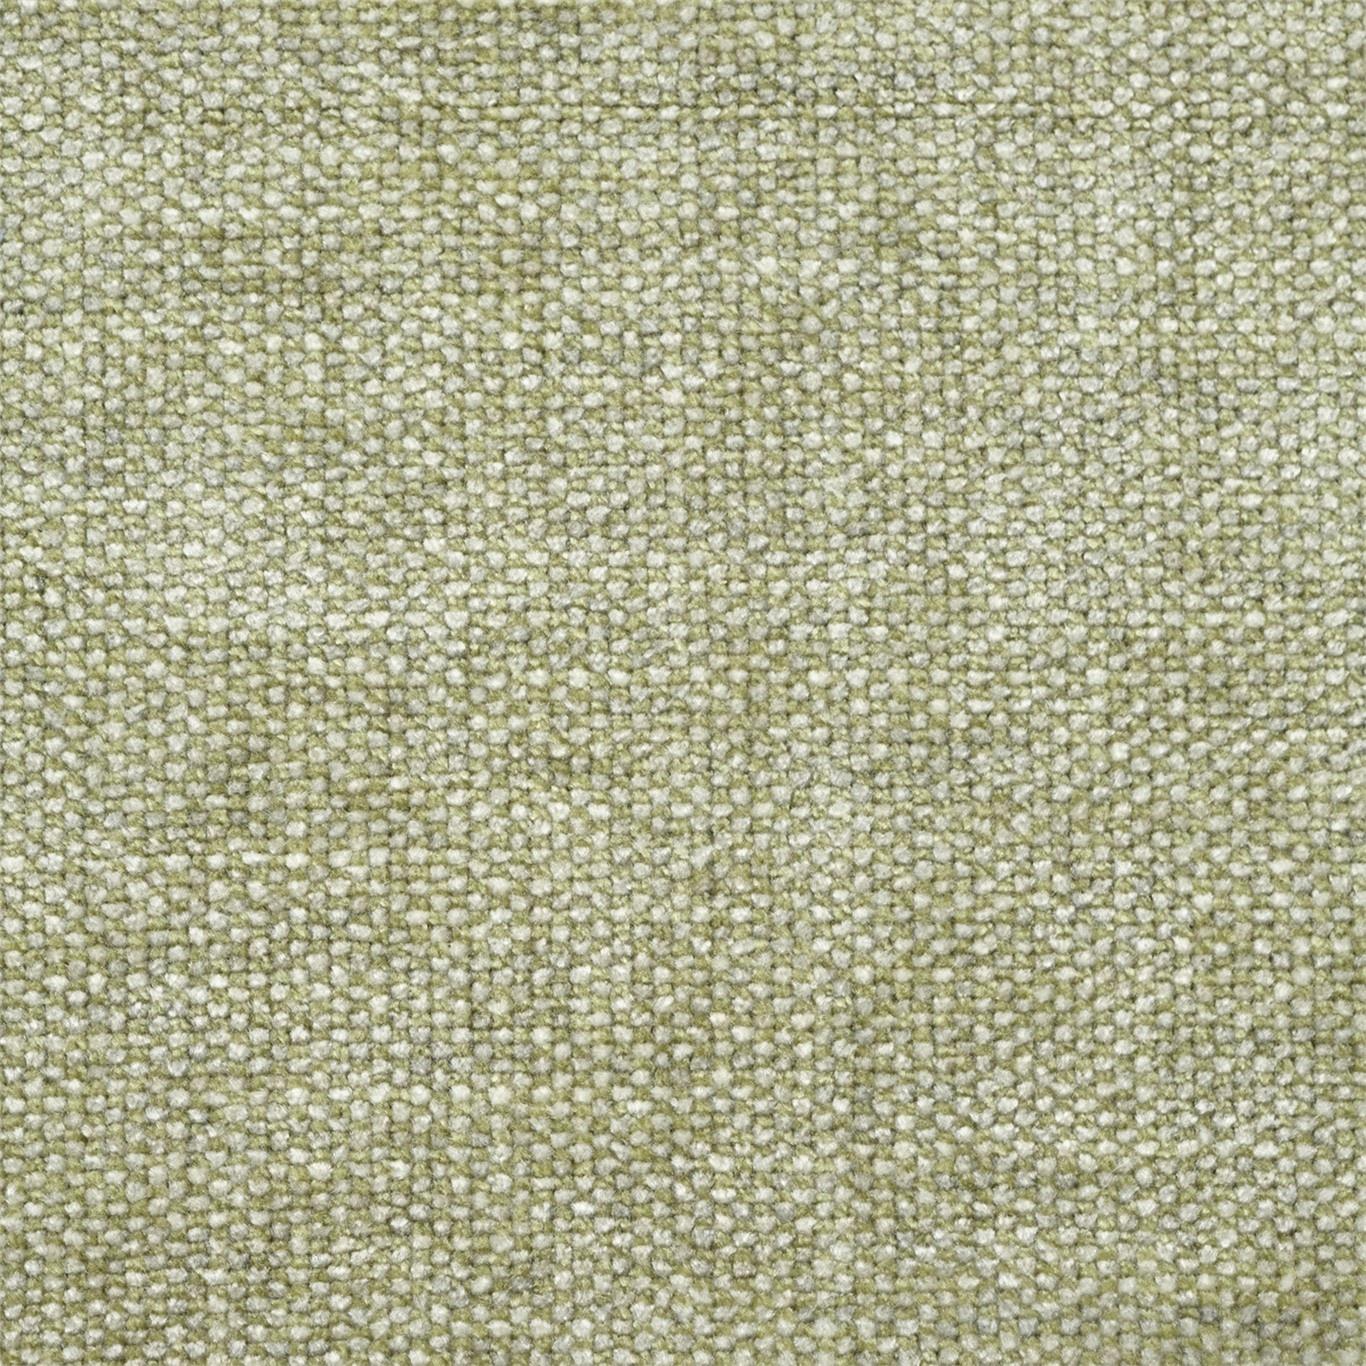 Image of Sanderson Moorbank Willow Fabric 236300